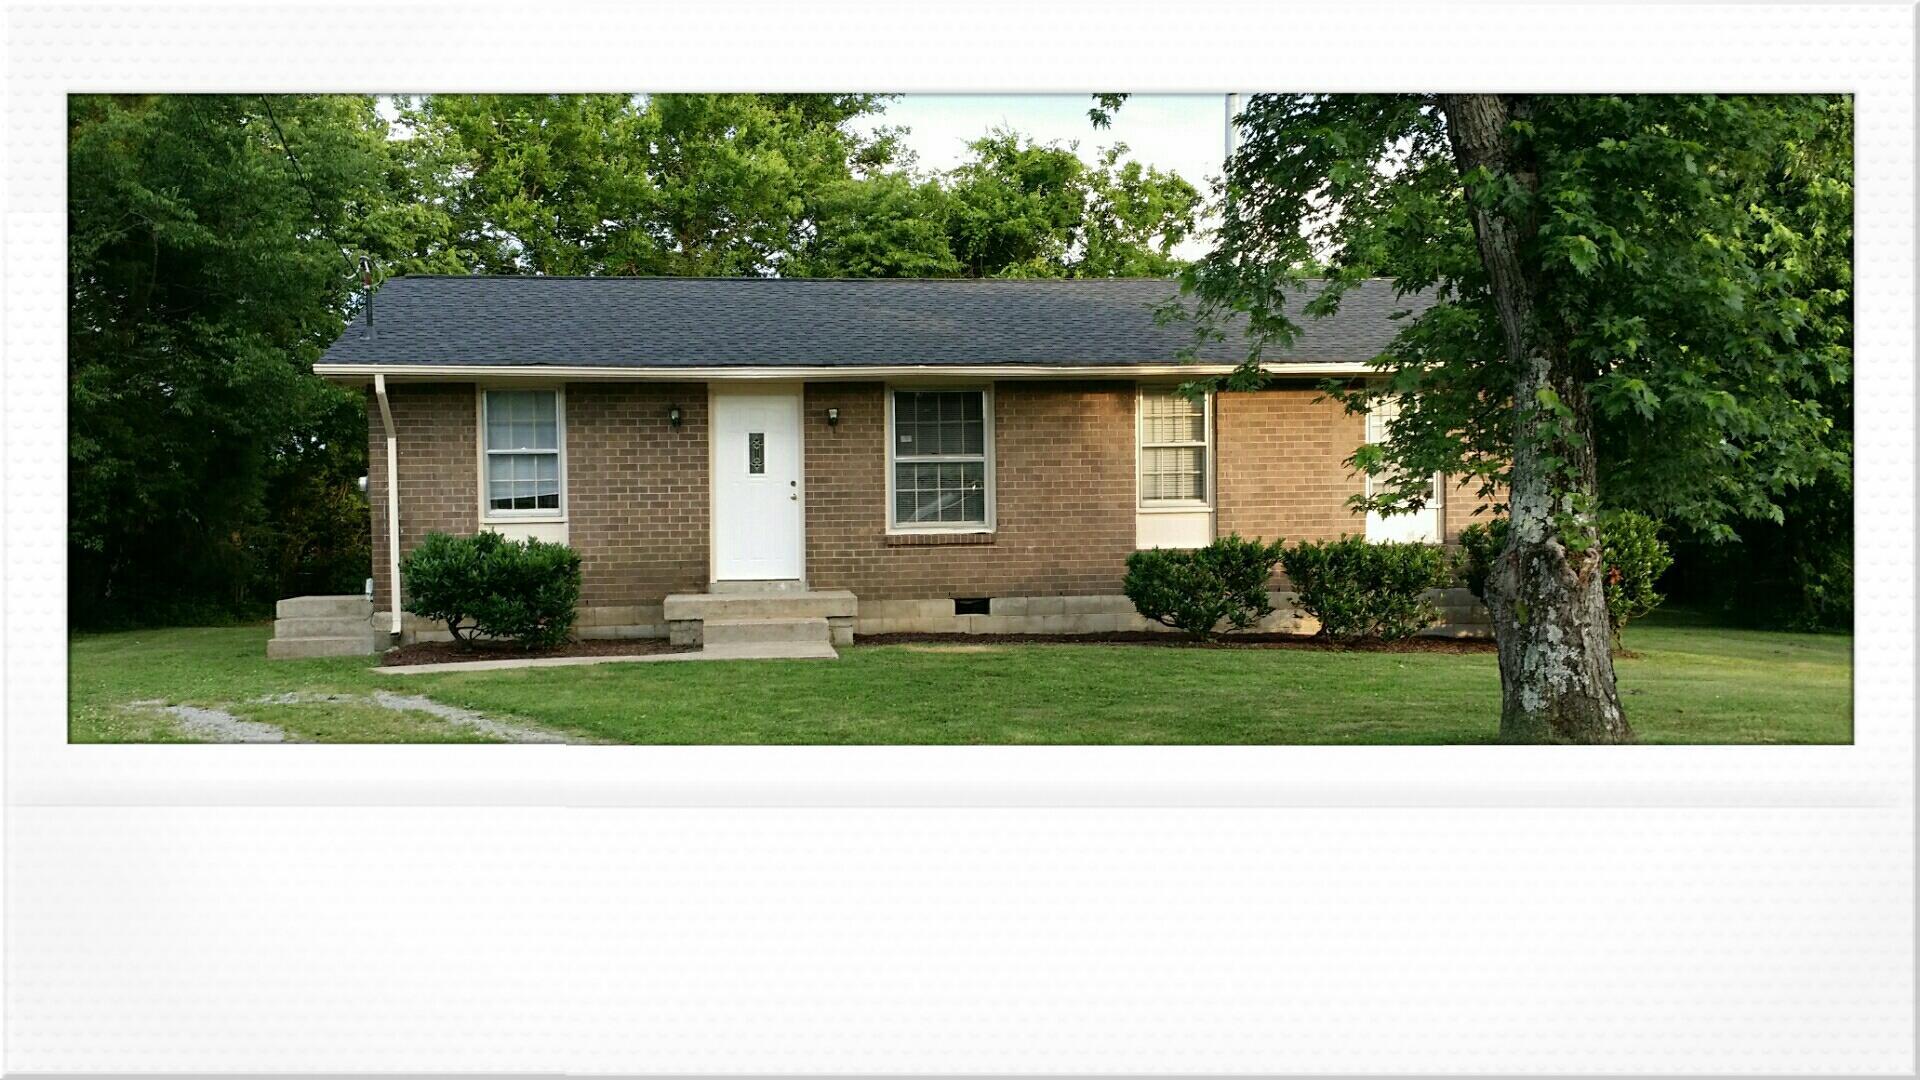 108 Cole Ct., Hendersonville, TN 37075